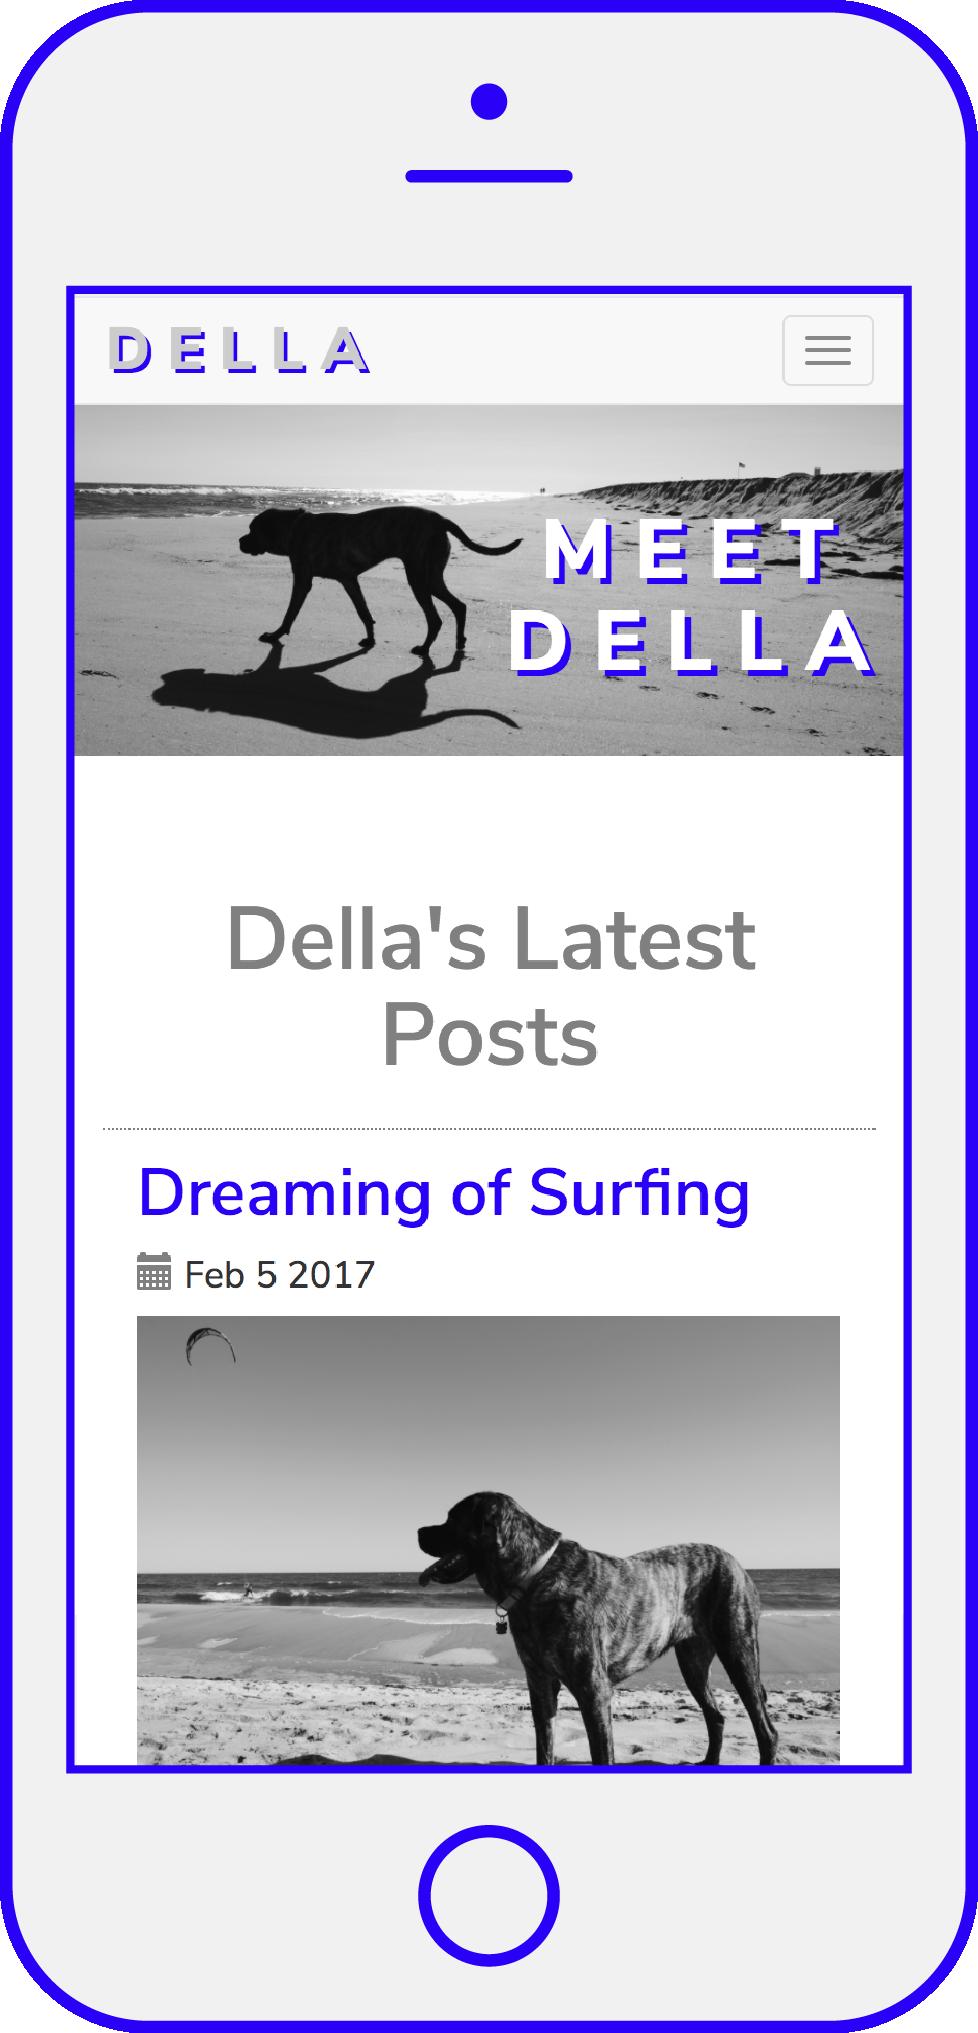 Della Blog by Leanne Luce using Django Python